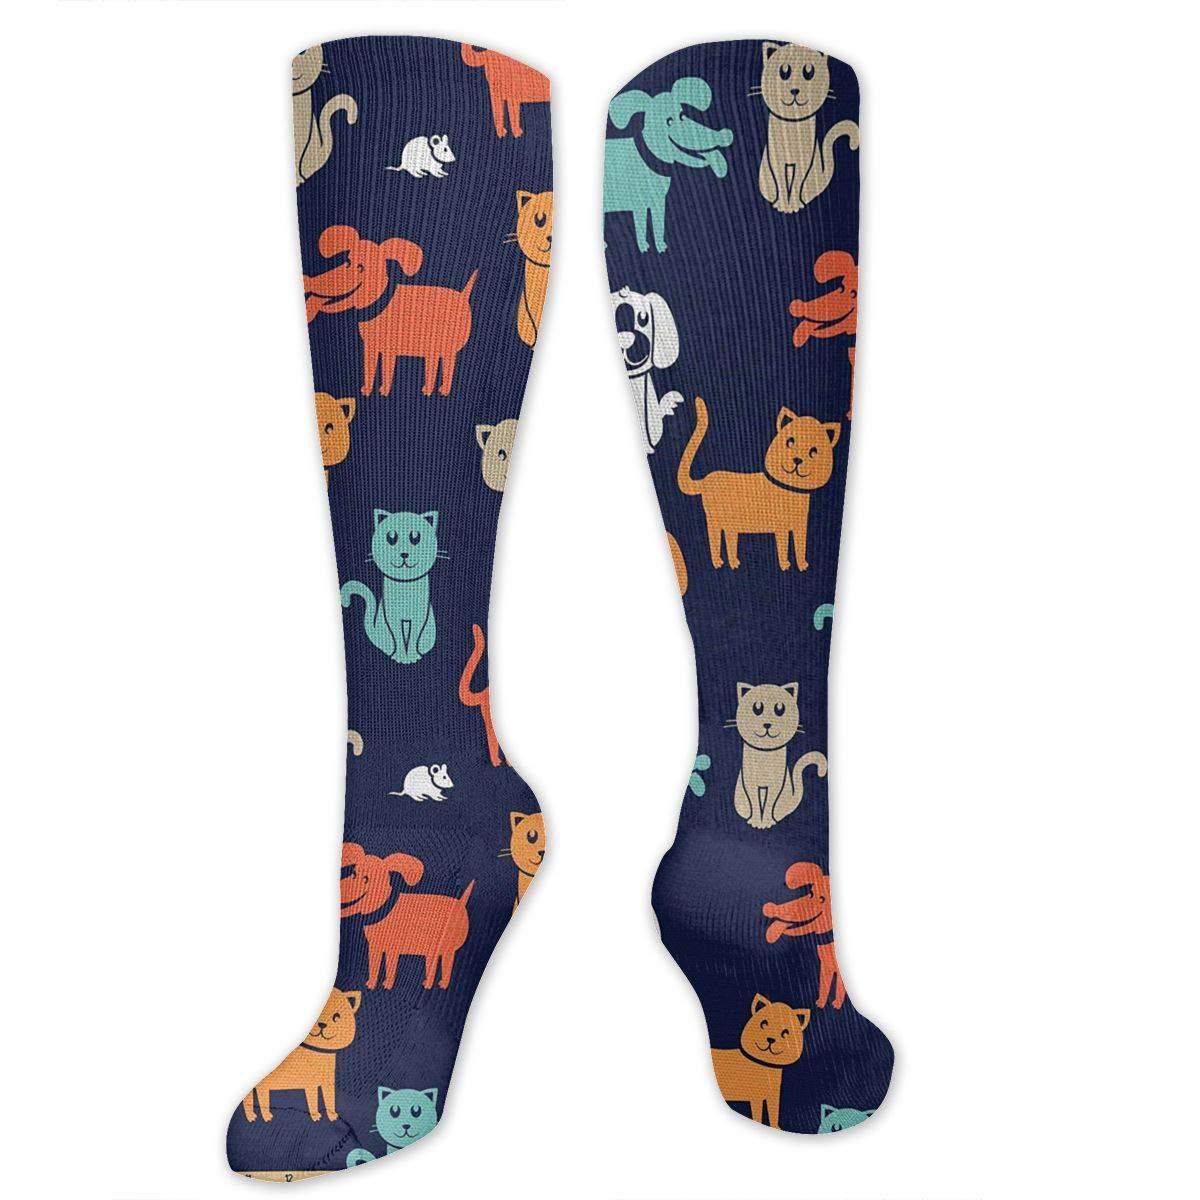 Men Multicolored Pattern Fashionable Fun Crew Cotton Socks Chanwazibibiliu Cartoon Style Cat Dog Mens Colorful Dress Socks Funky